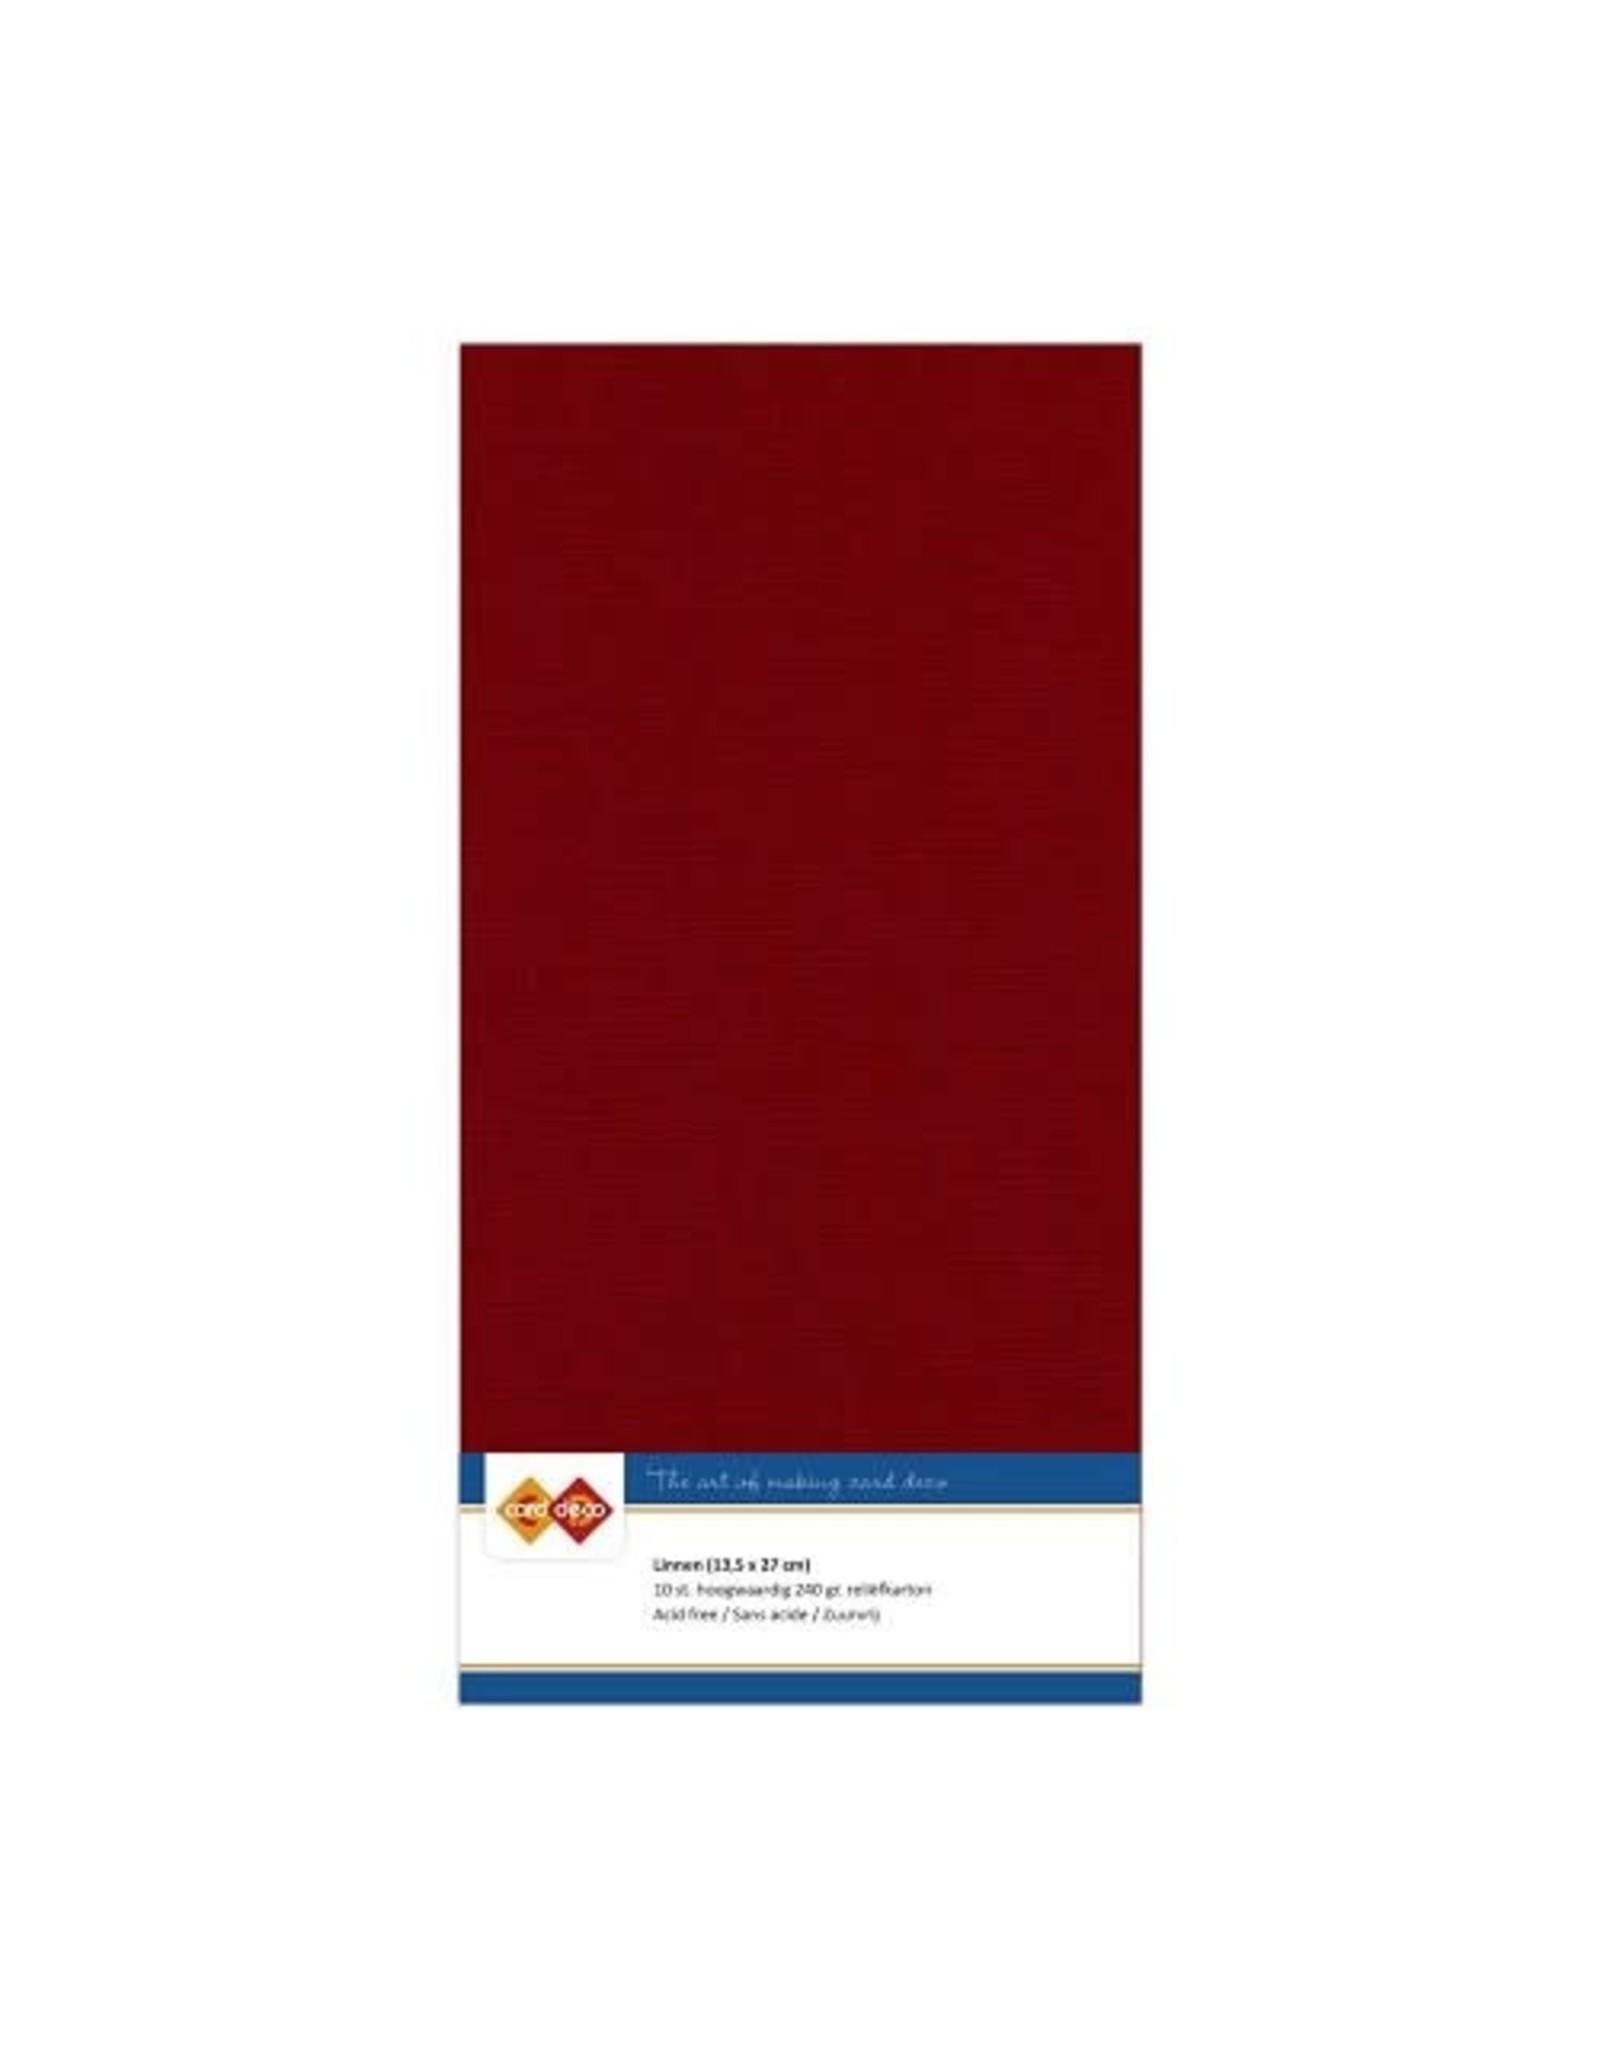 Card Deco Card Deco EssentialsLinnenkarton - Vierkant - Bordeaux rood